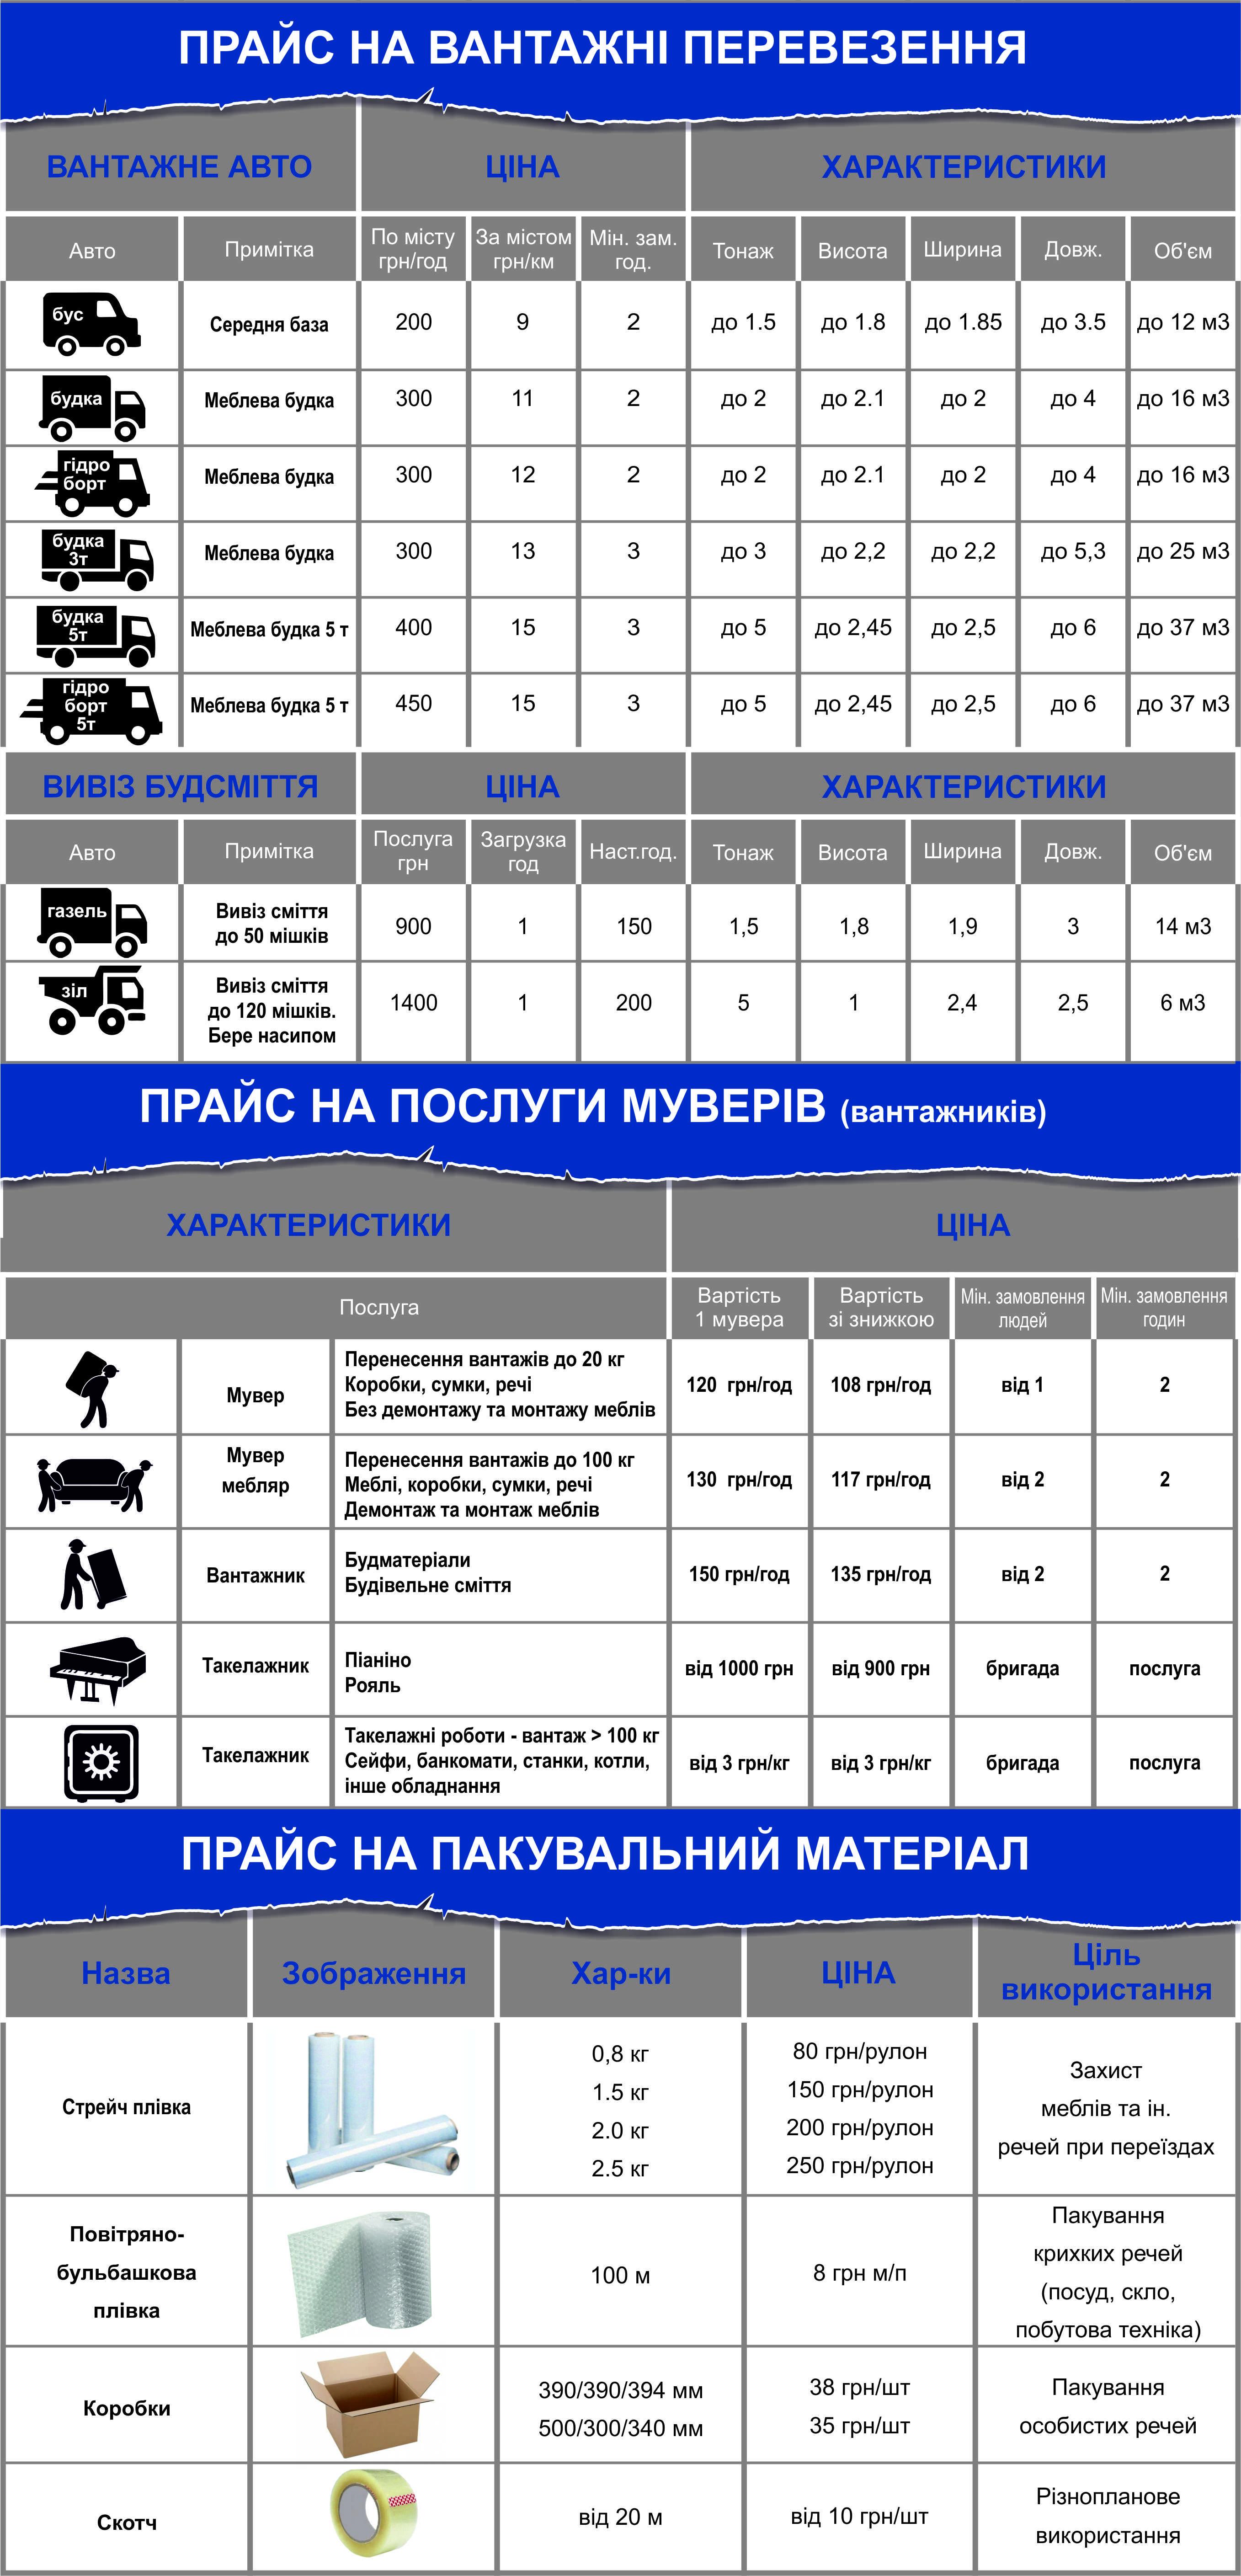 Тариф Український Богатир